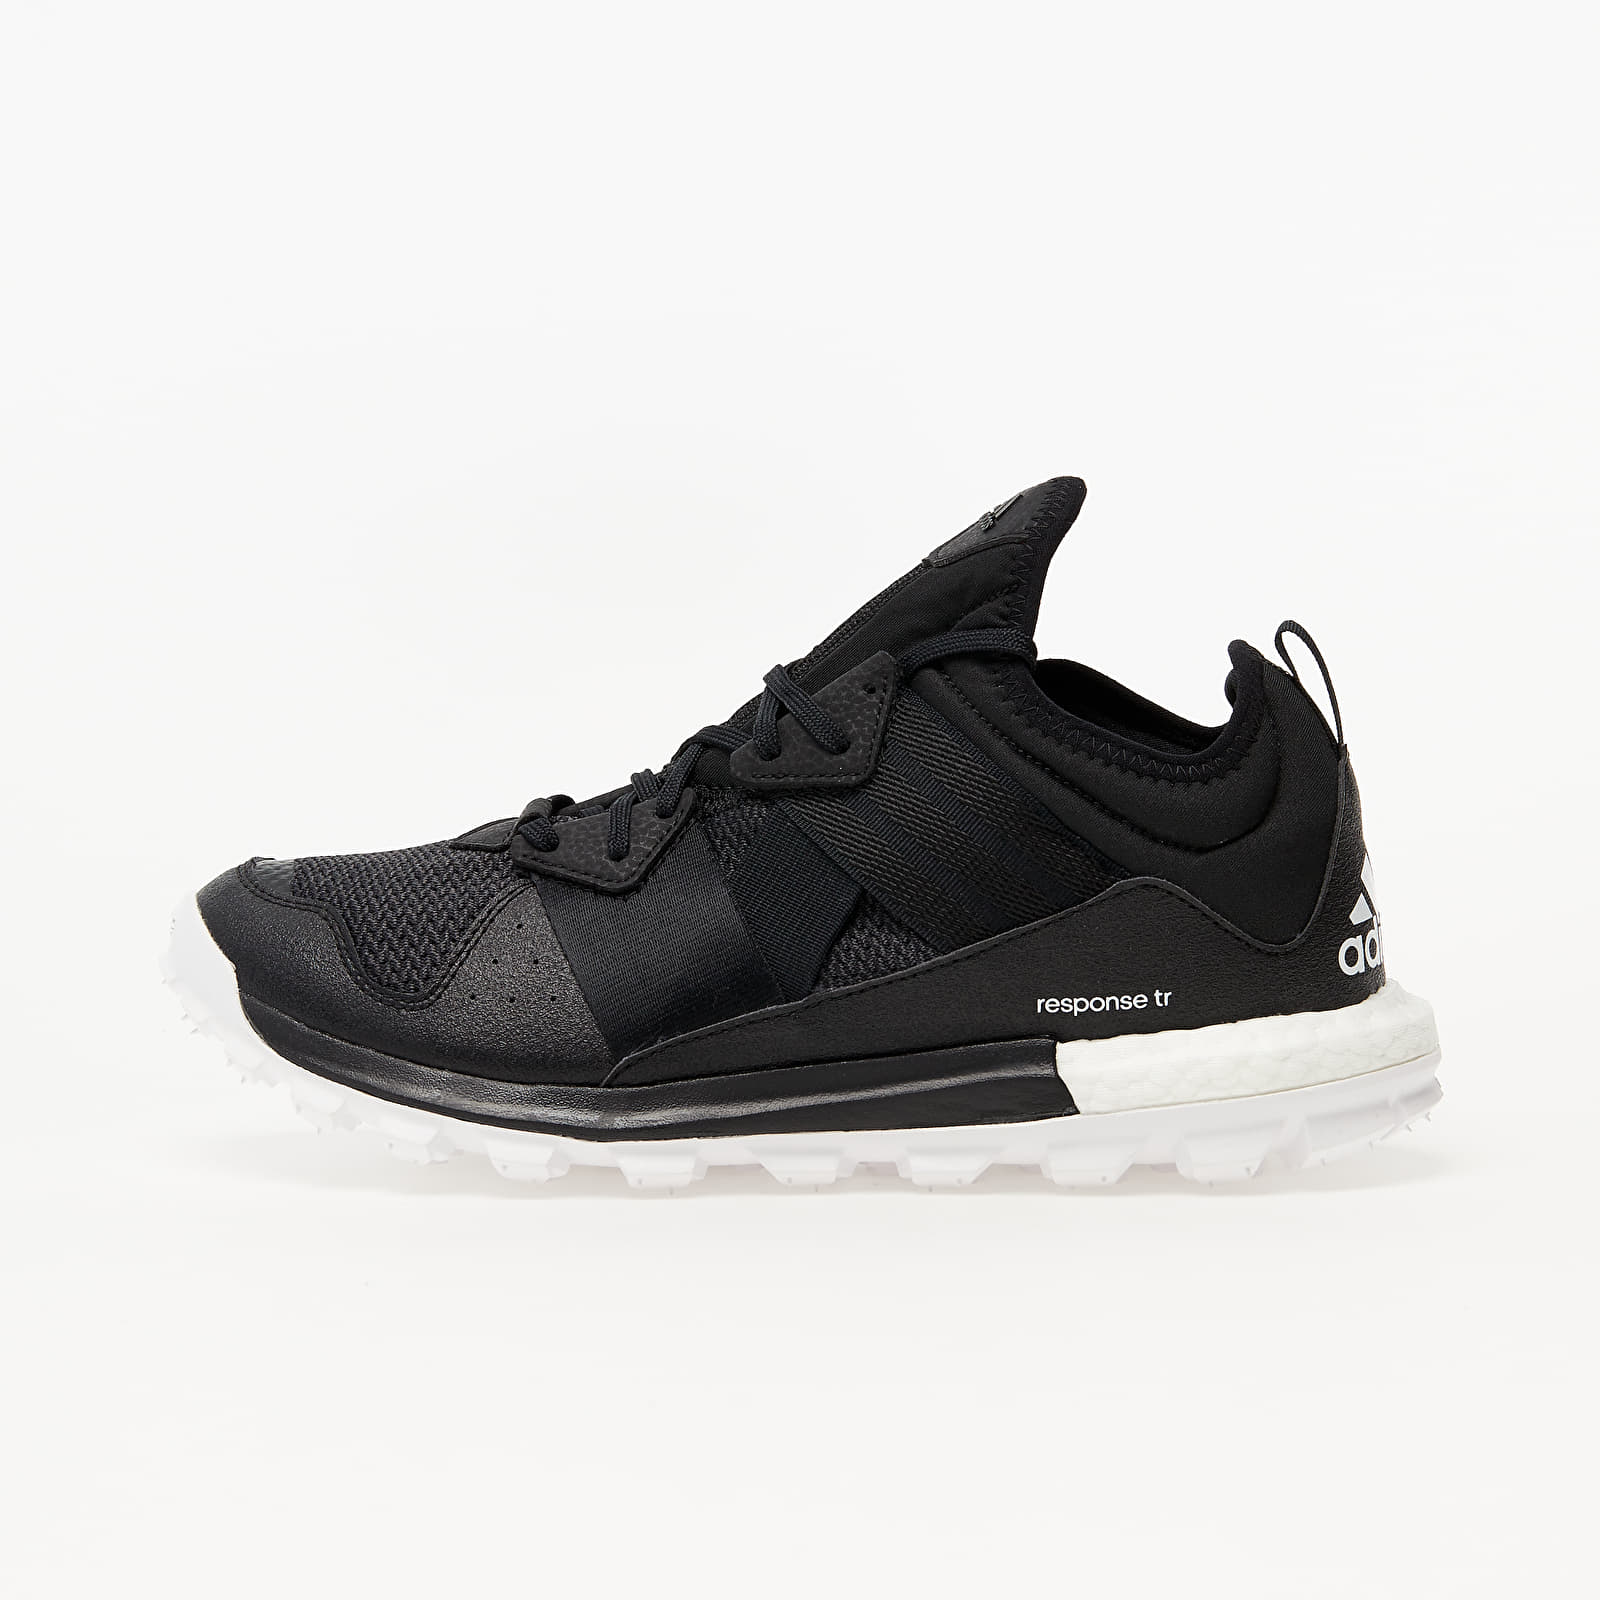 adidas Response TR Ftwr White/ Core Black/ Core Black FW6858